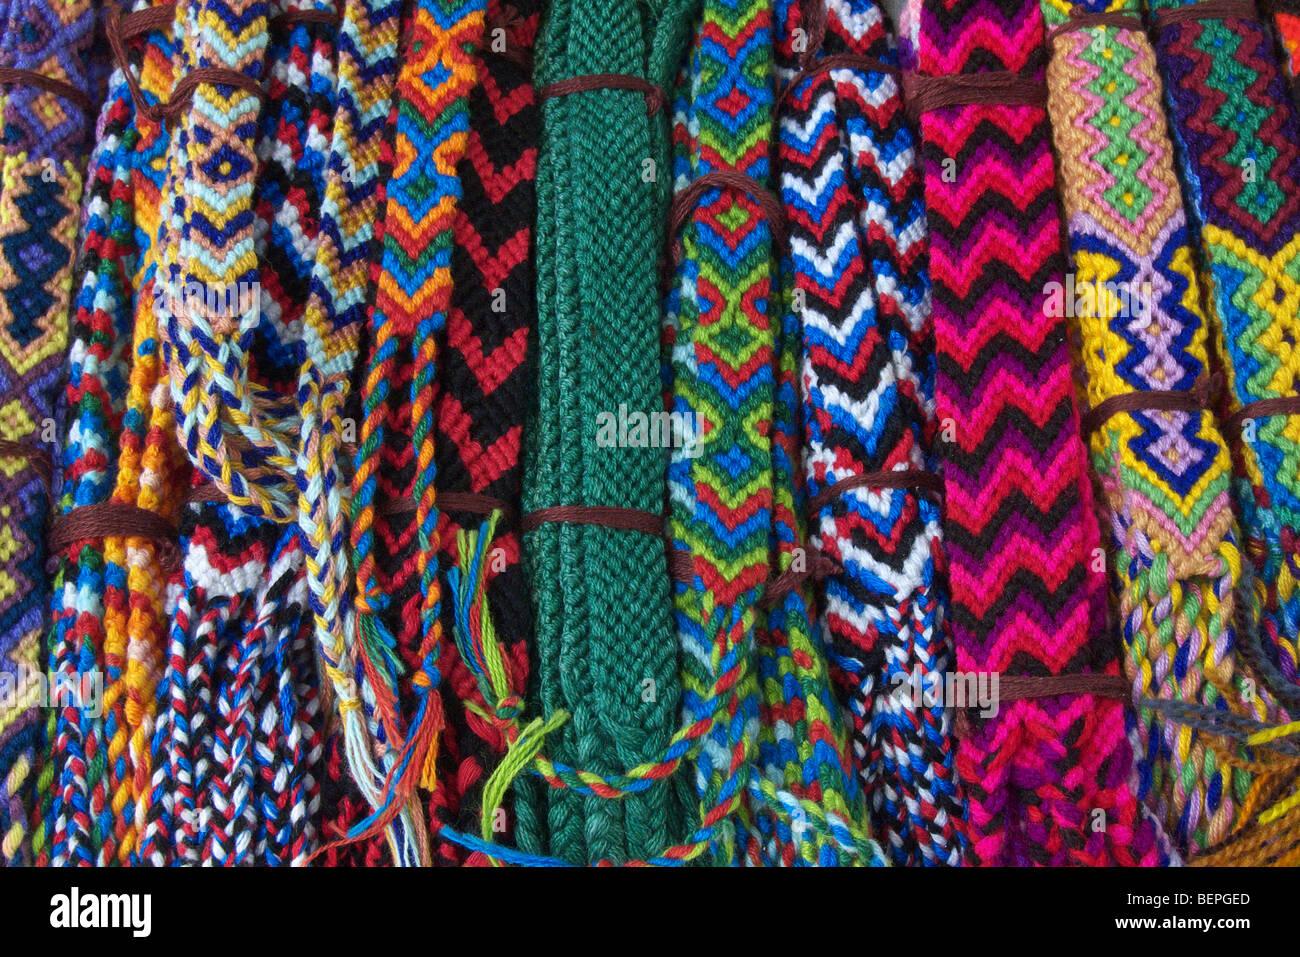 GUATEMALA Woven bracelets on sale in santiago de Atitlan. PHOTO BY SEAN SPRAGUE 2009 - Stock Image